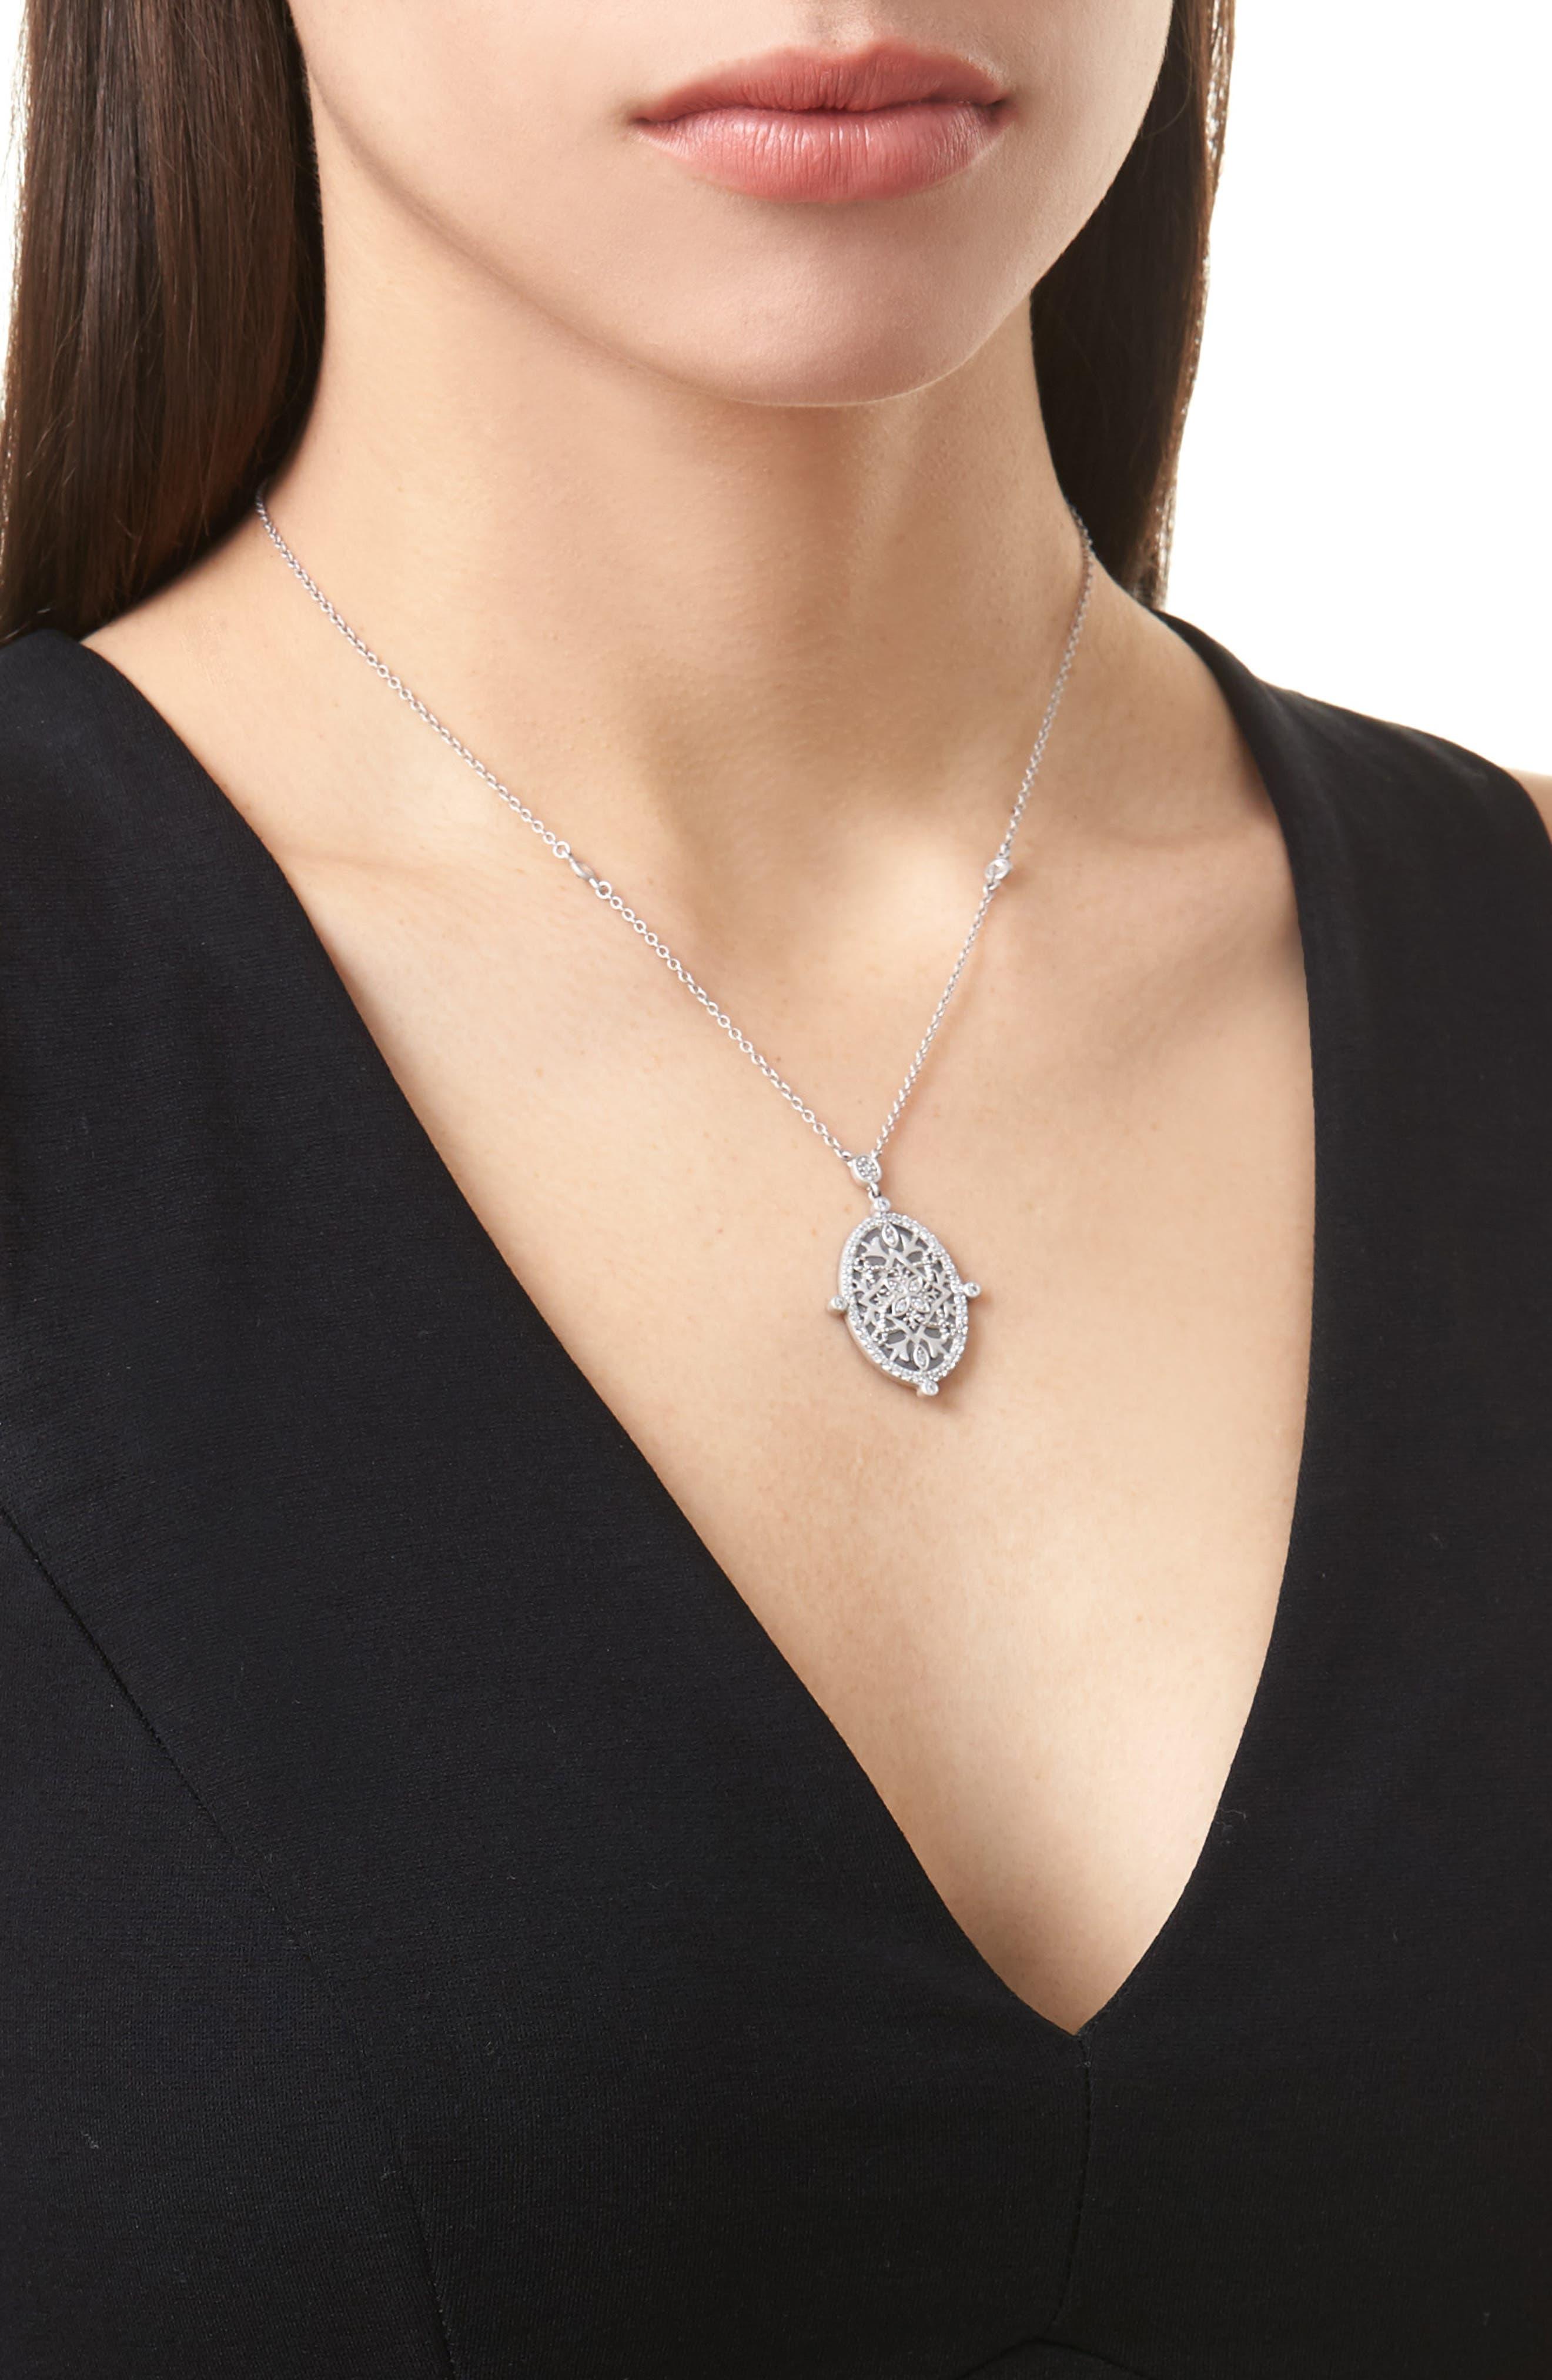 Contemporary Deco Celestial Pendant Necklace,                             Alternate thumbnail 2, color,                             040